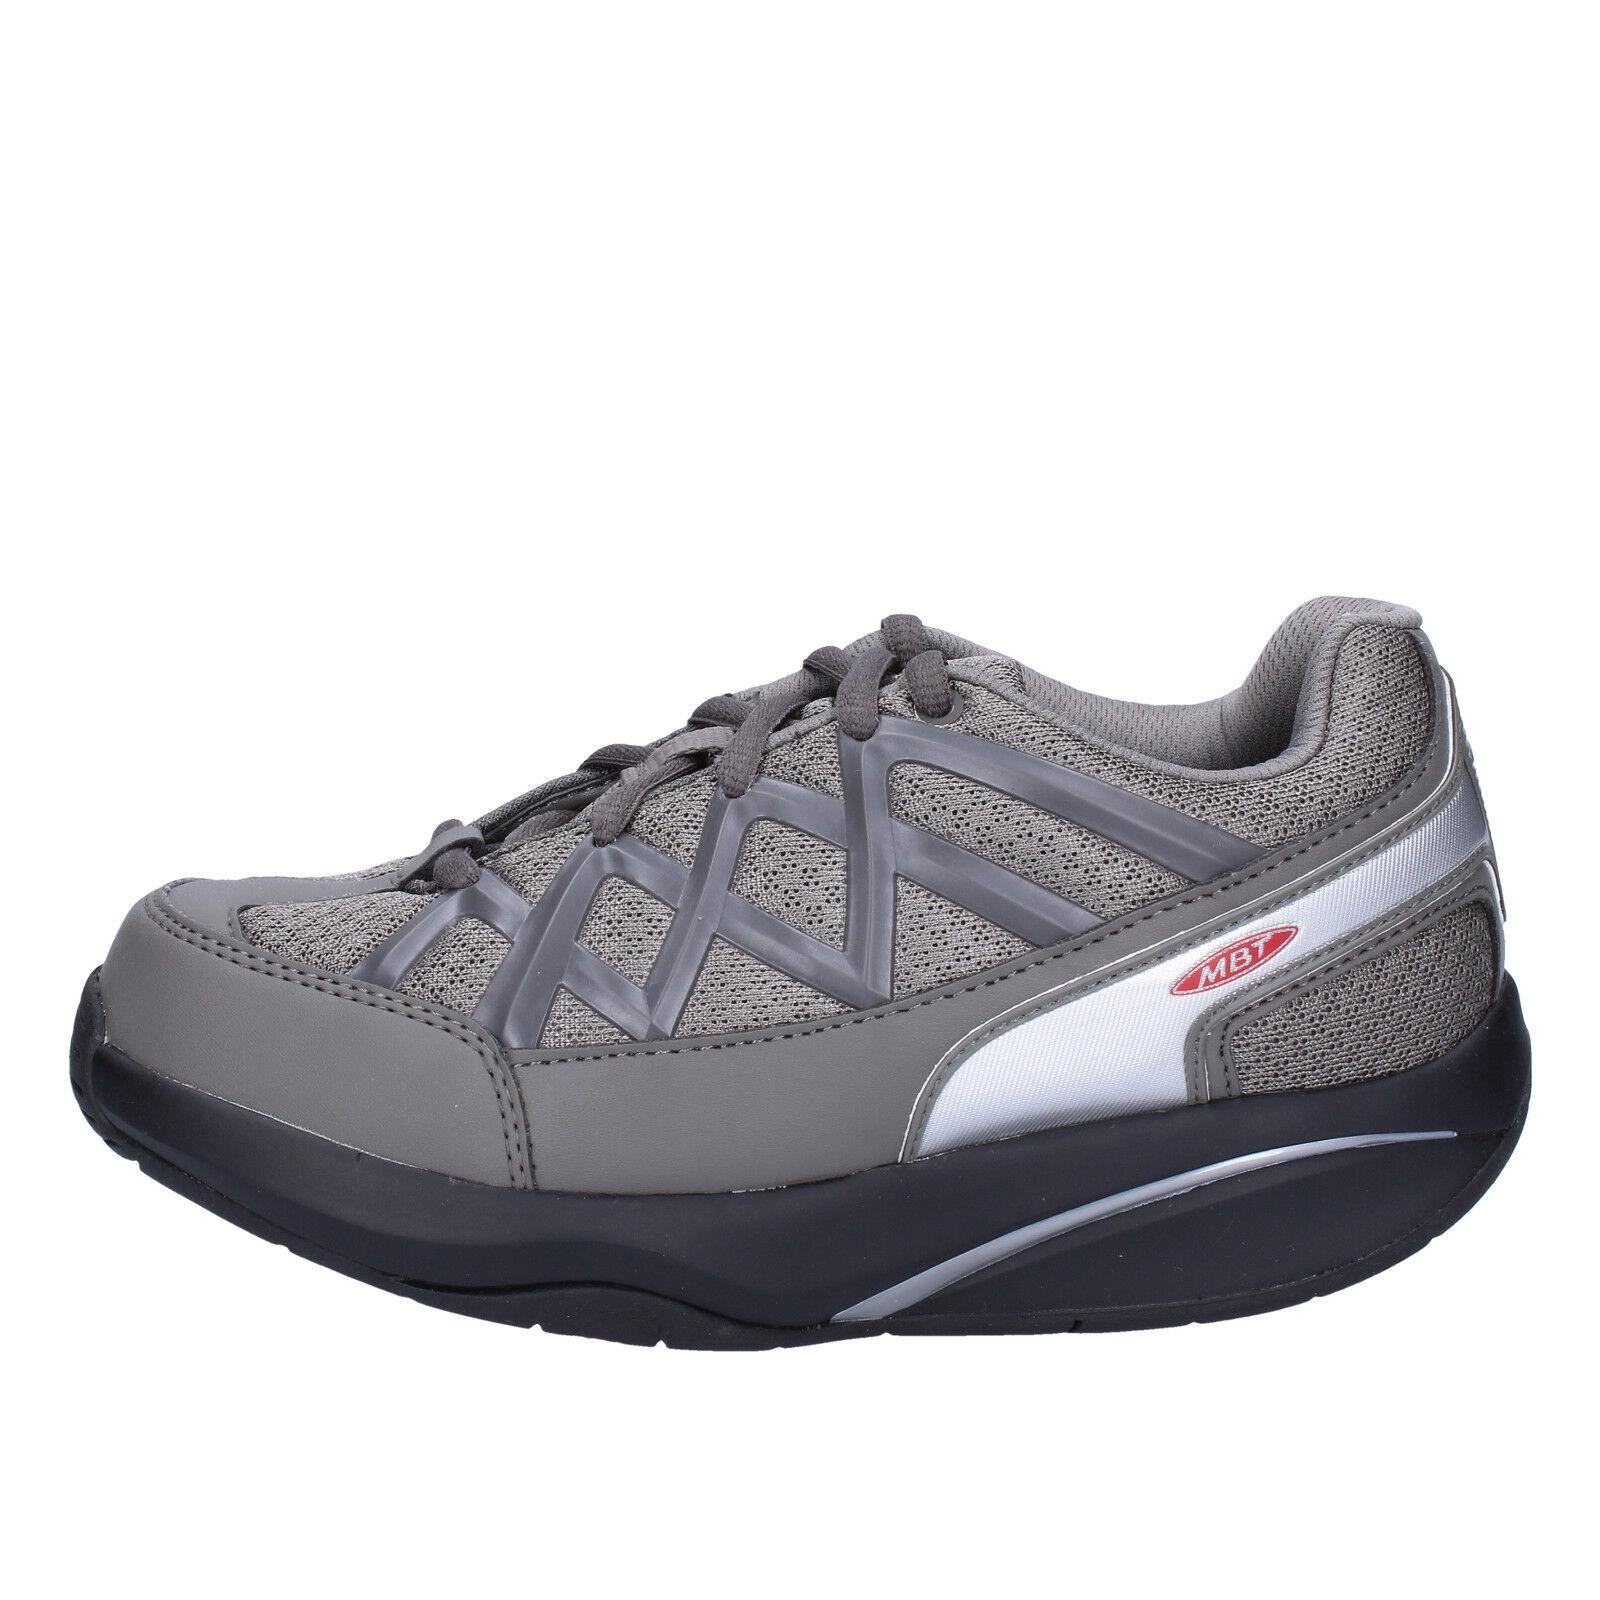 women's shoes MBT 5 / 5,5 () sneakers gray textile dynamic AB390-36